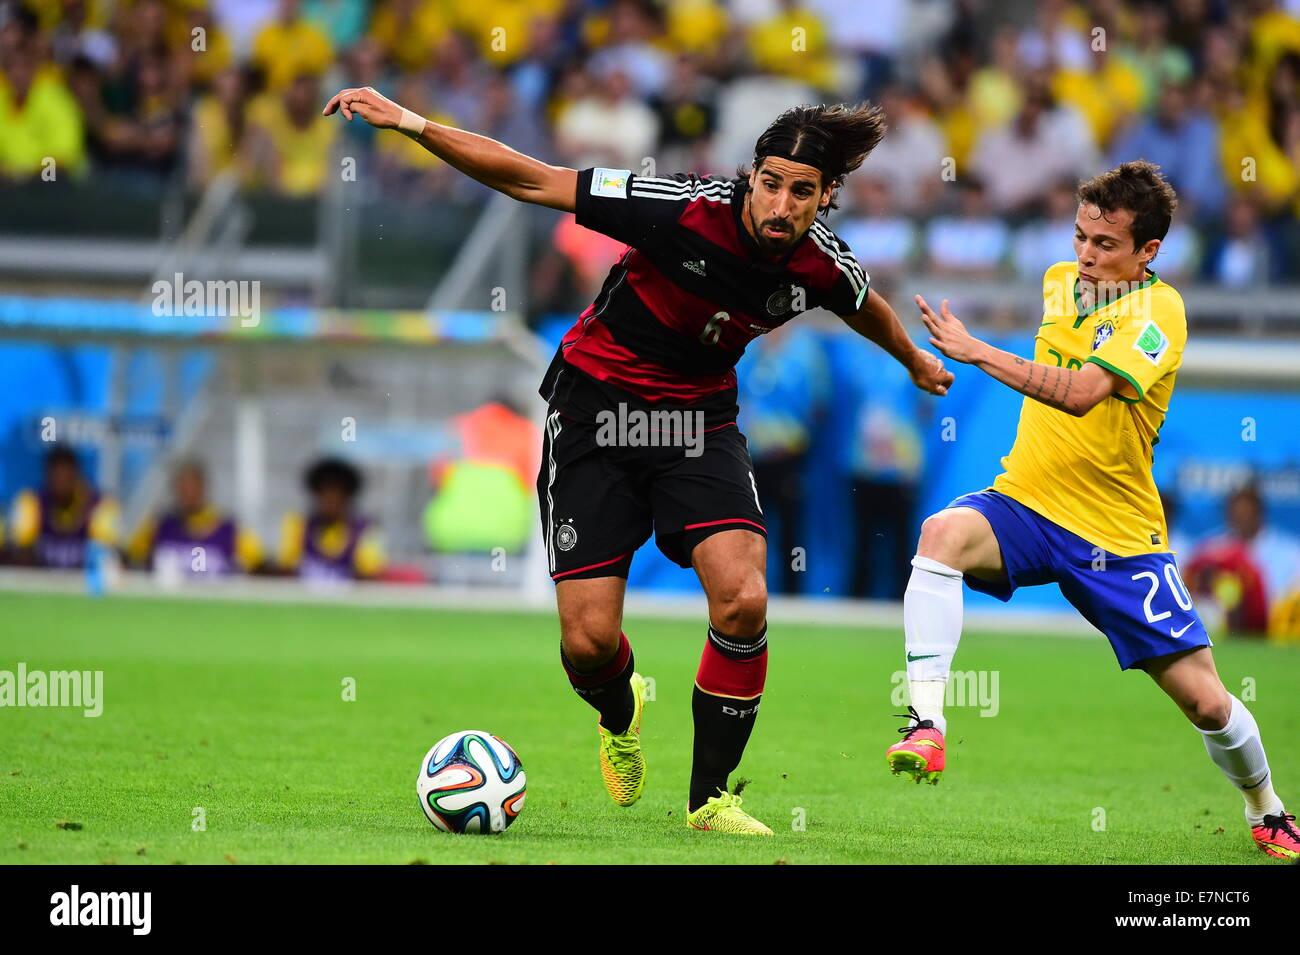 Sami khedira photos sami khedira images alamy - Coupe du monde de la fifa bresil 2014 ...